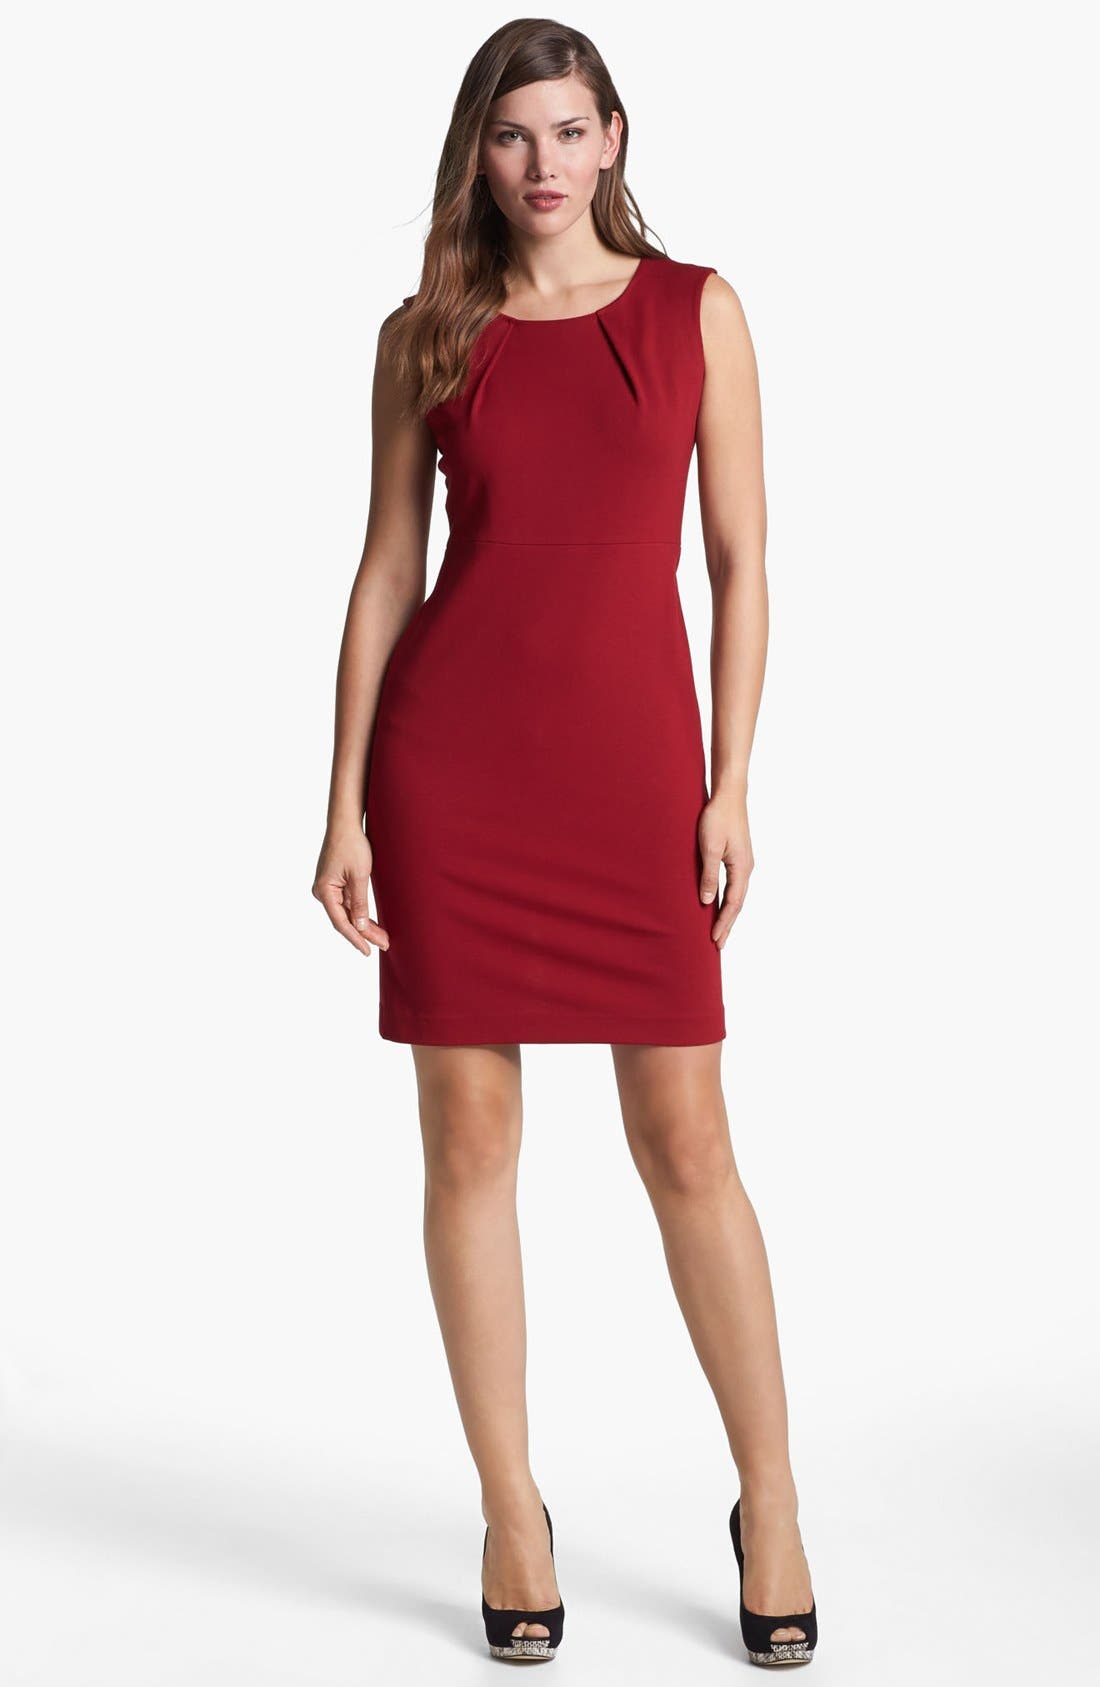 Alternate Image 1 Selected - Lafayette 148 New York Sleeveless Punto Milano Dress